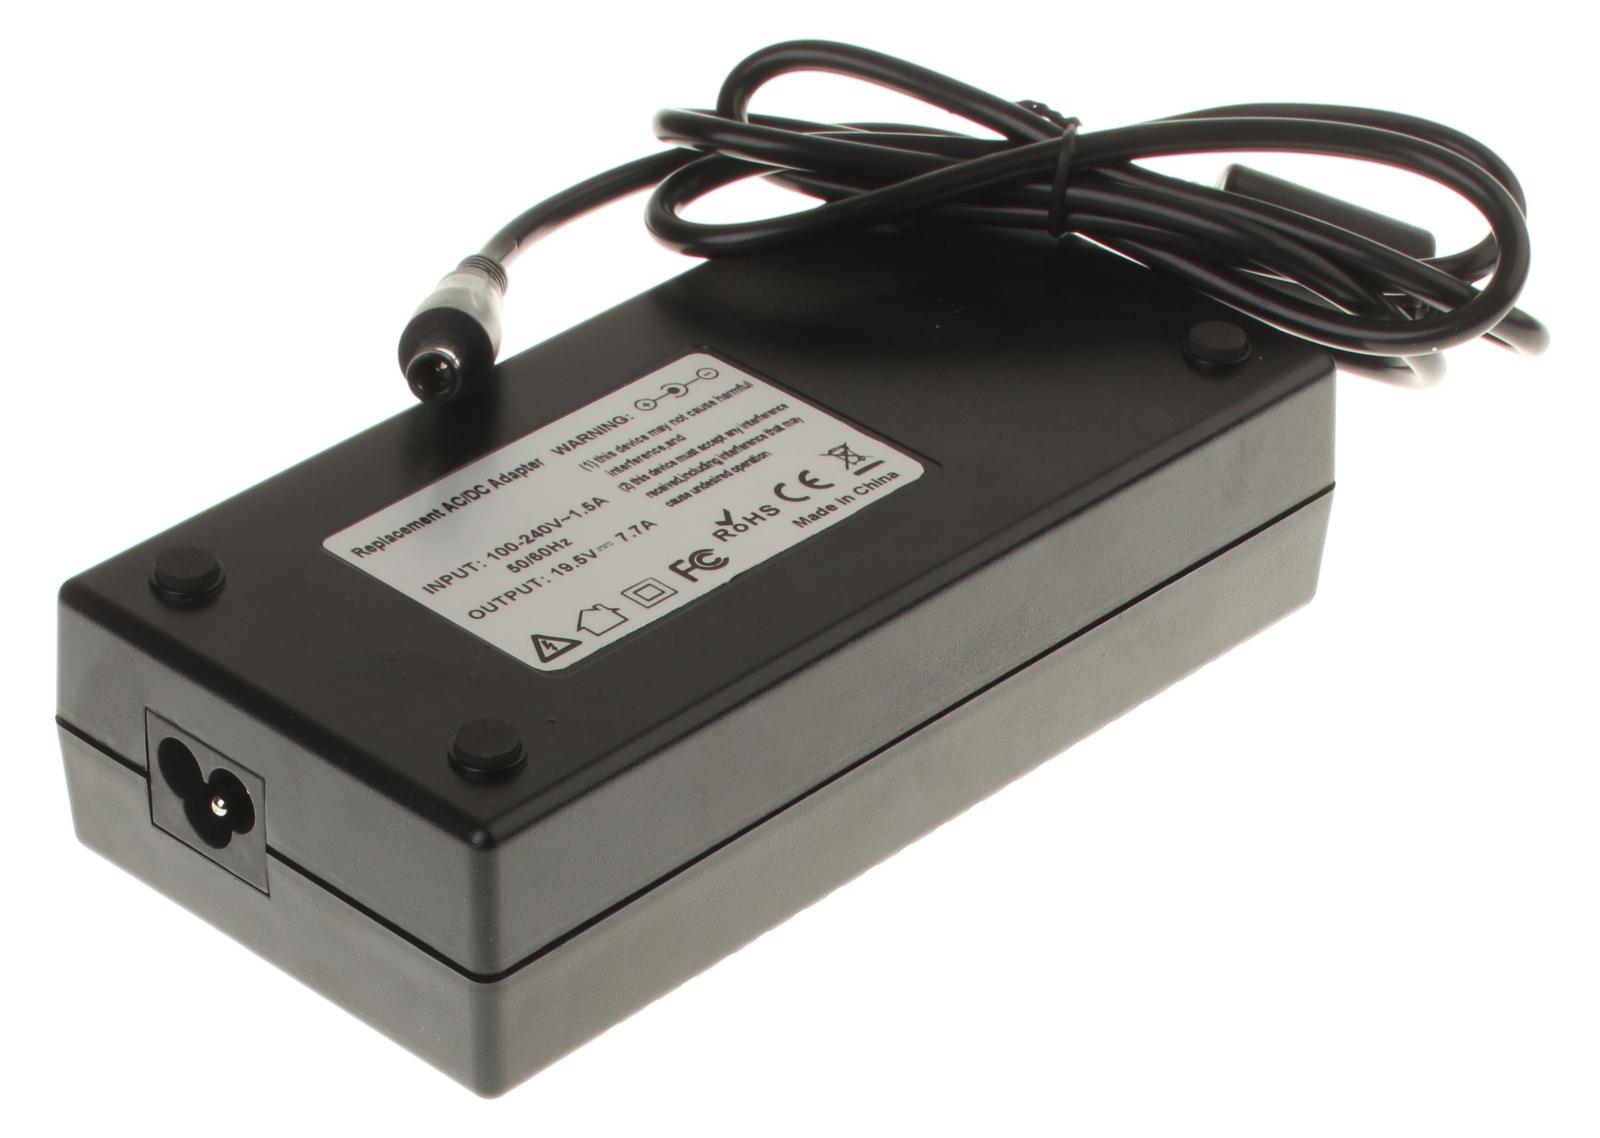 Блок питания (адаптер питания) для ноутбука Dell XPS 17 (L702x). Артикул 22-213. Напряжение (V): 19,5